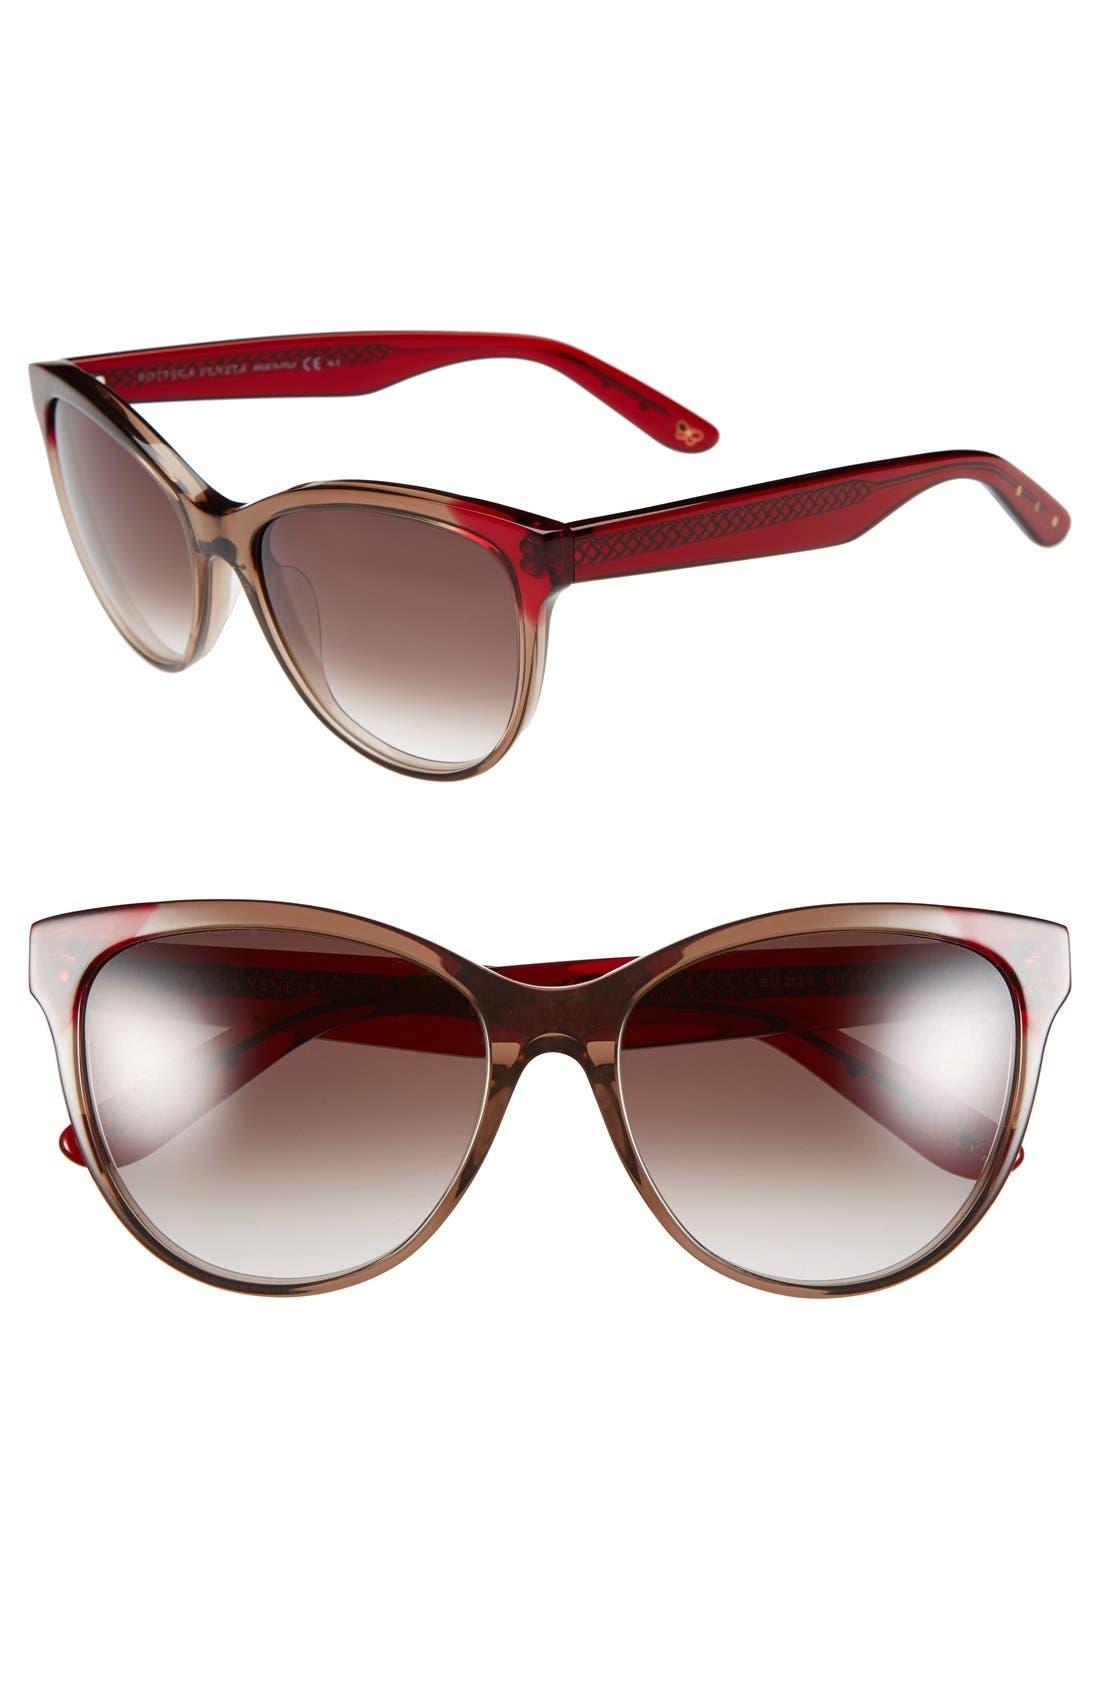 Alternate Image 1 Selected - Bottega Veneta 56mm Retro Gradient Lens Sunglasses